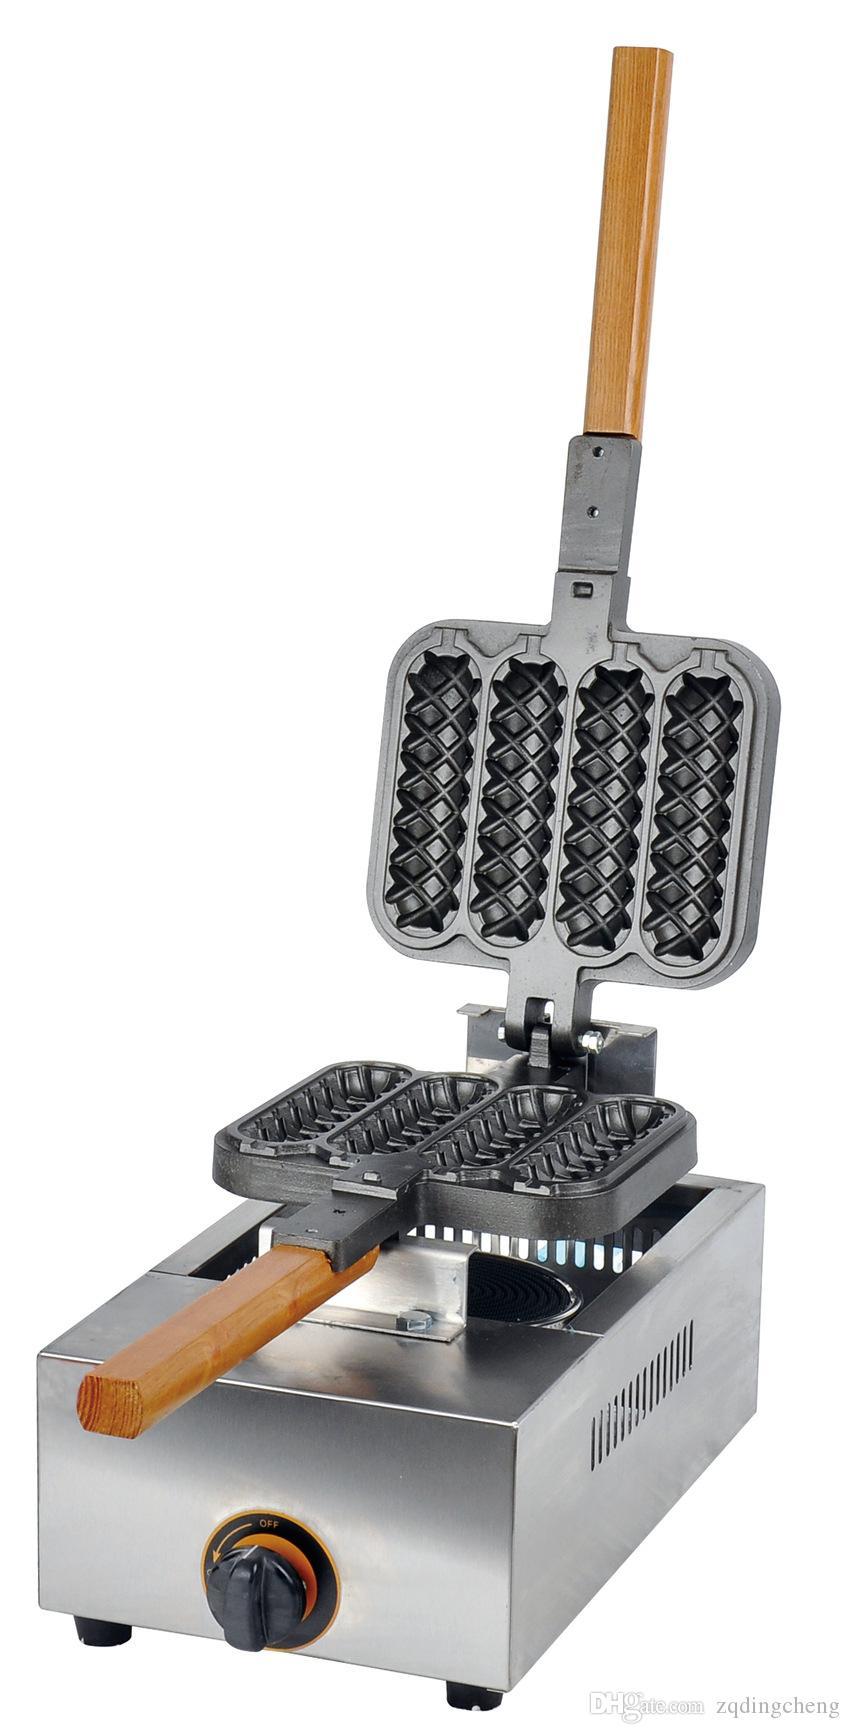 Spedizione gratuita ~ Gas lolly waffle maker waffle machine / francese hot dog maker / waffle ferro, trasporto veloce da fedex